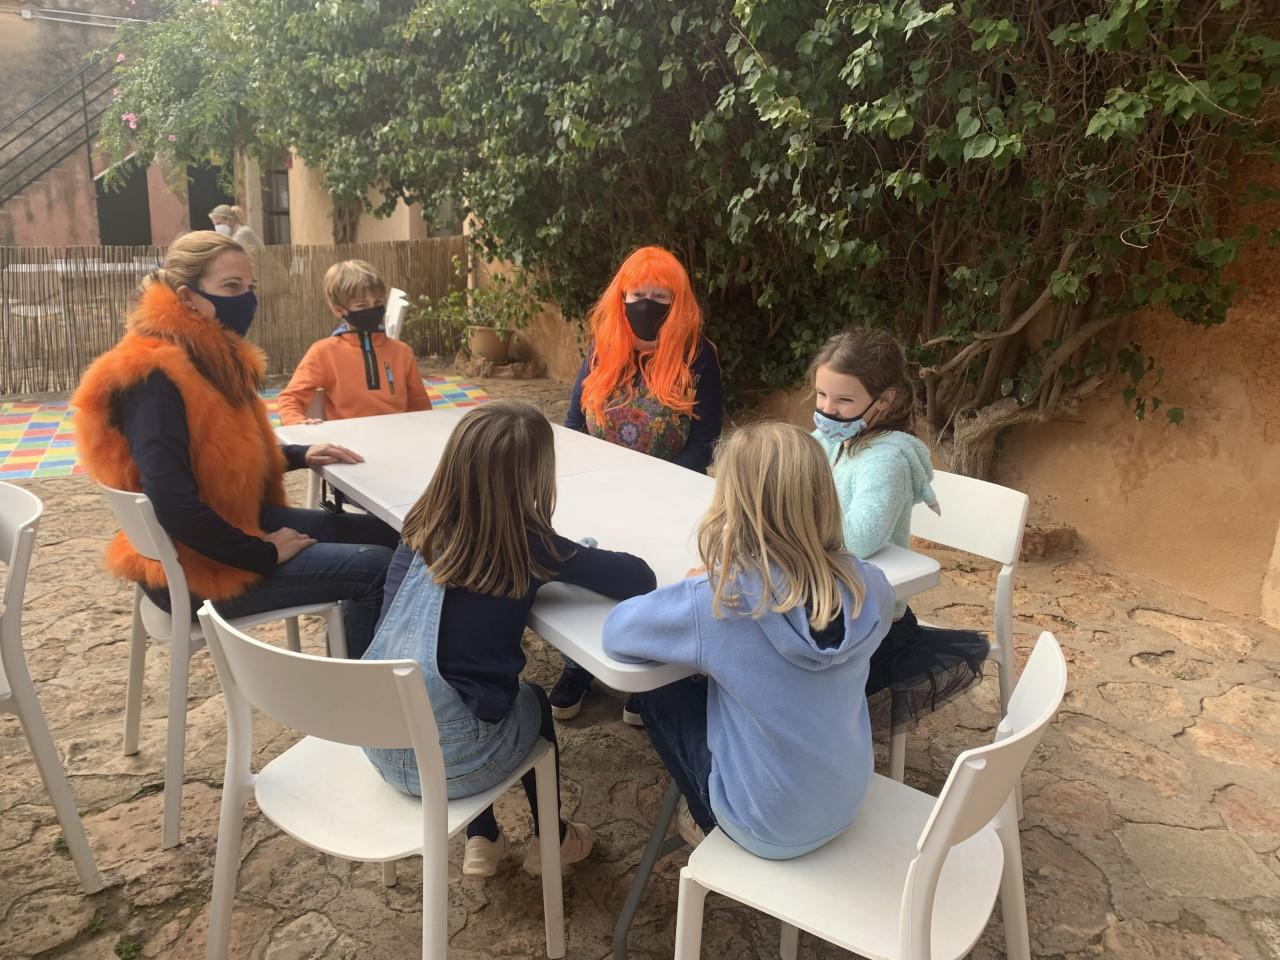 The children brainstormed fundraising techniques